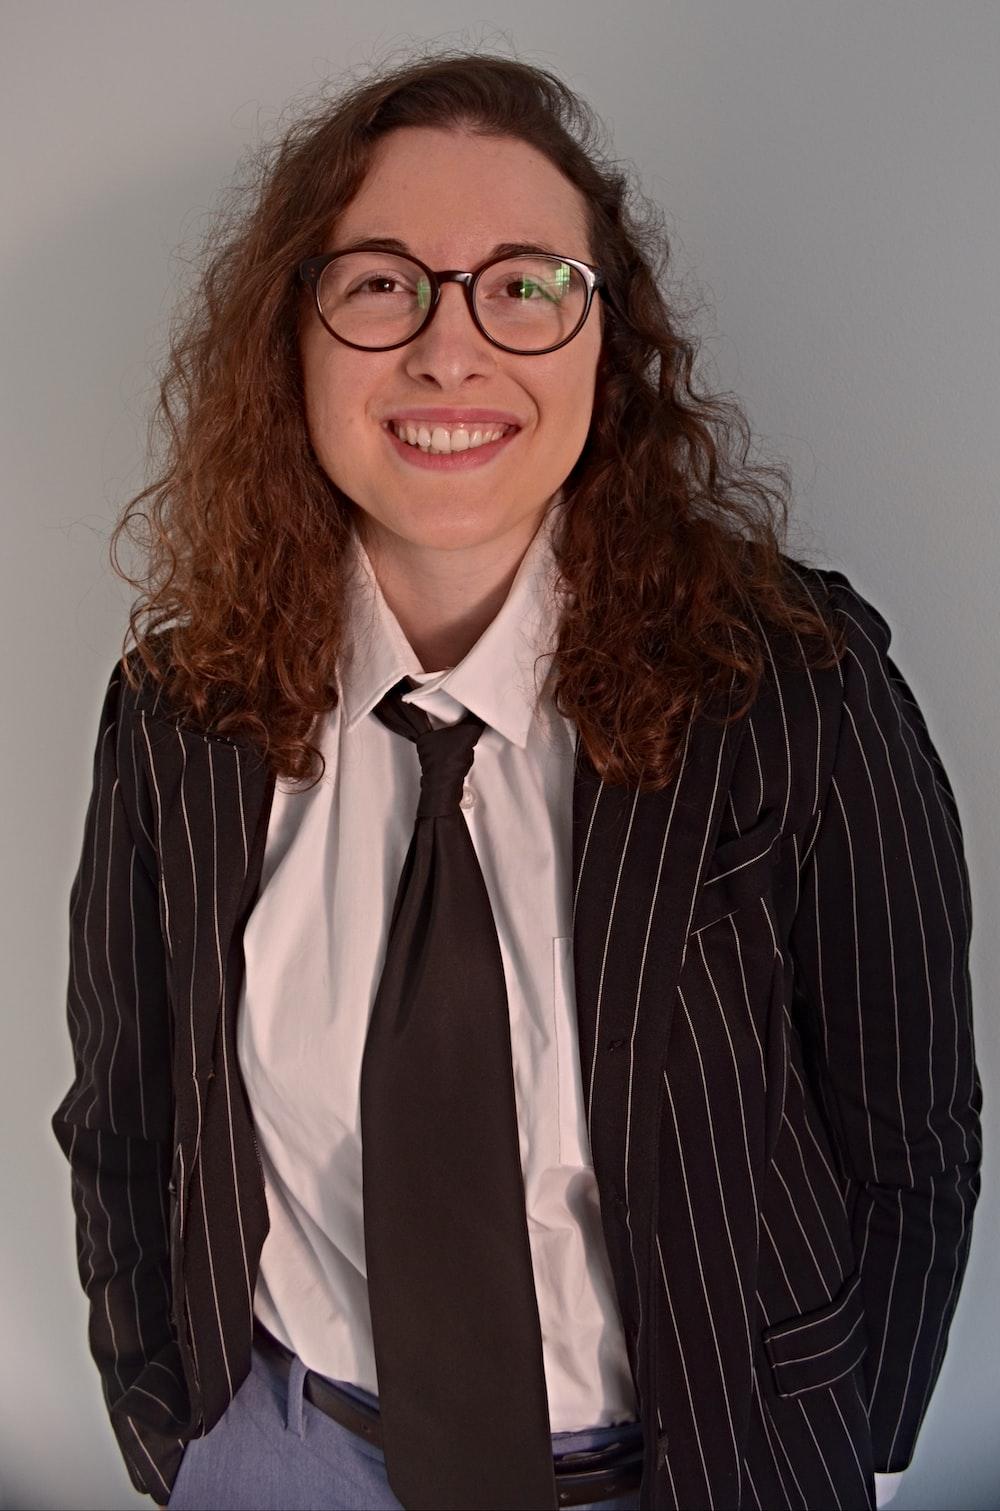 woman in black and white striped blazer wearing eyeglasses